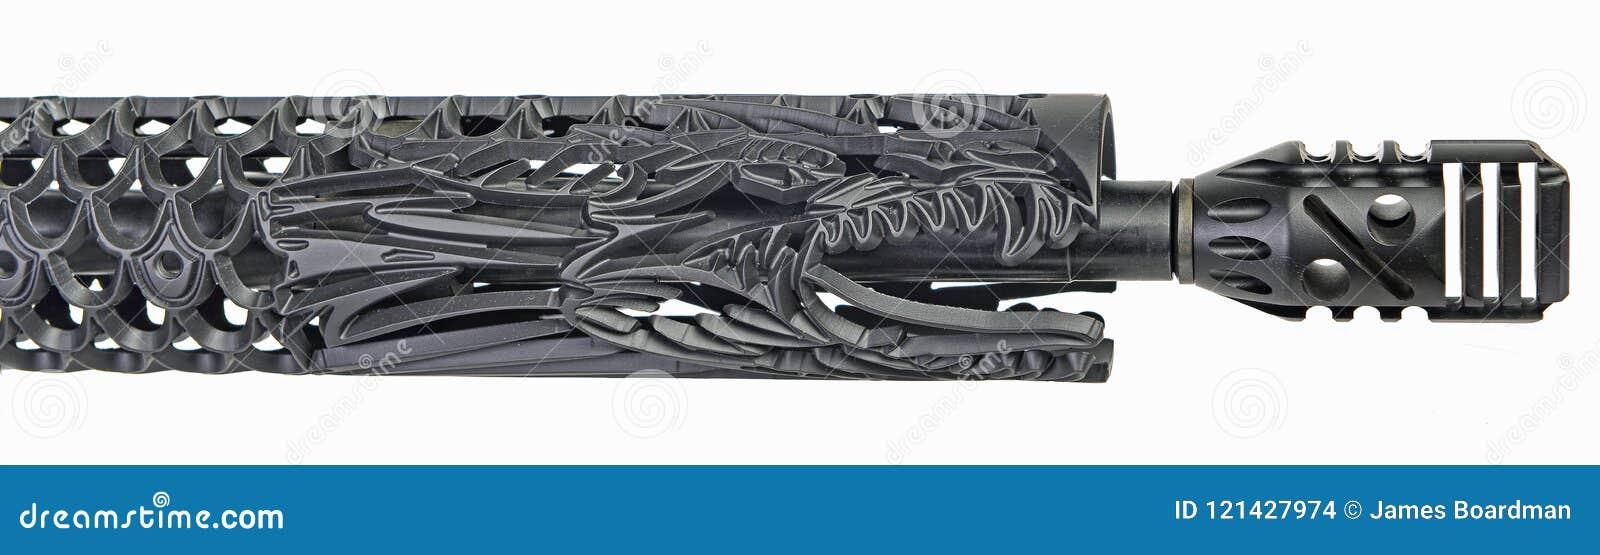 Custom Dragon Hand Guard For An AR15 Stock Photo - Image of